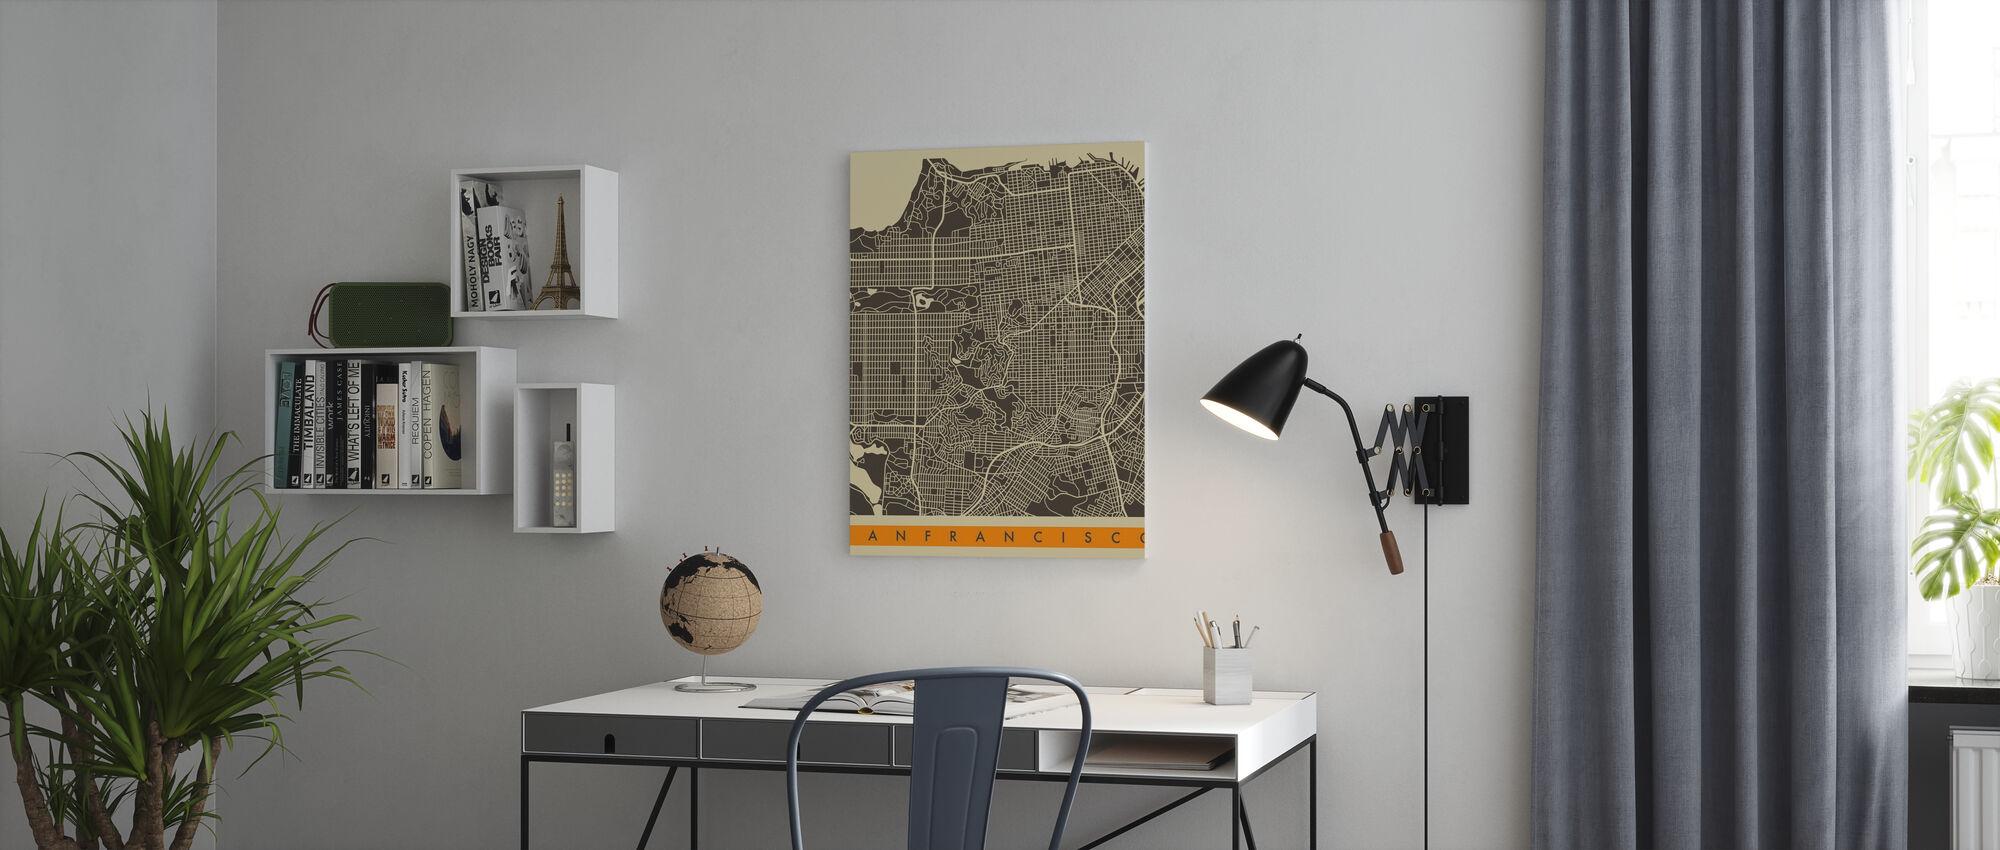 City Map - San Francisco - Canvas print - Office